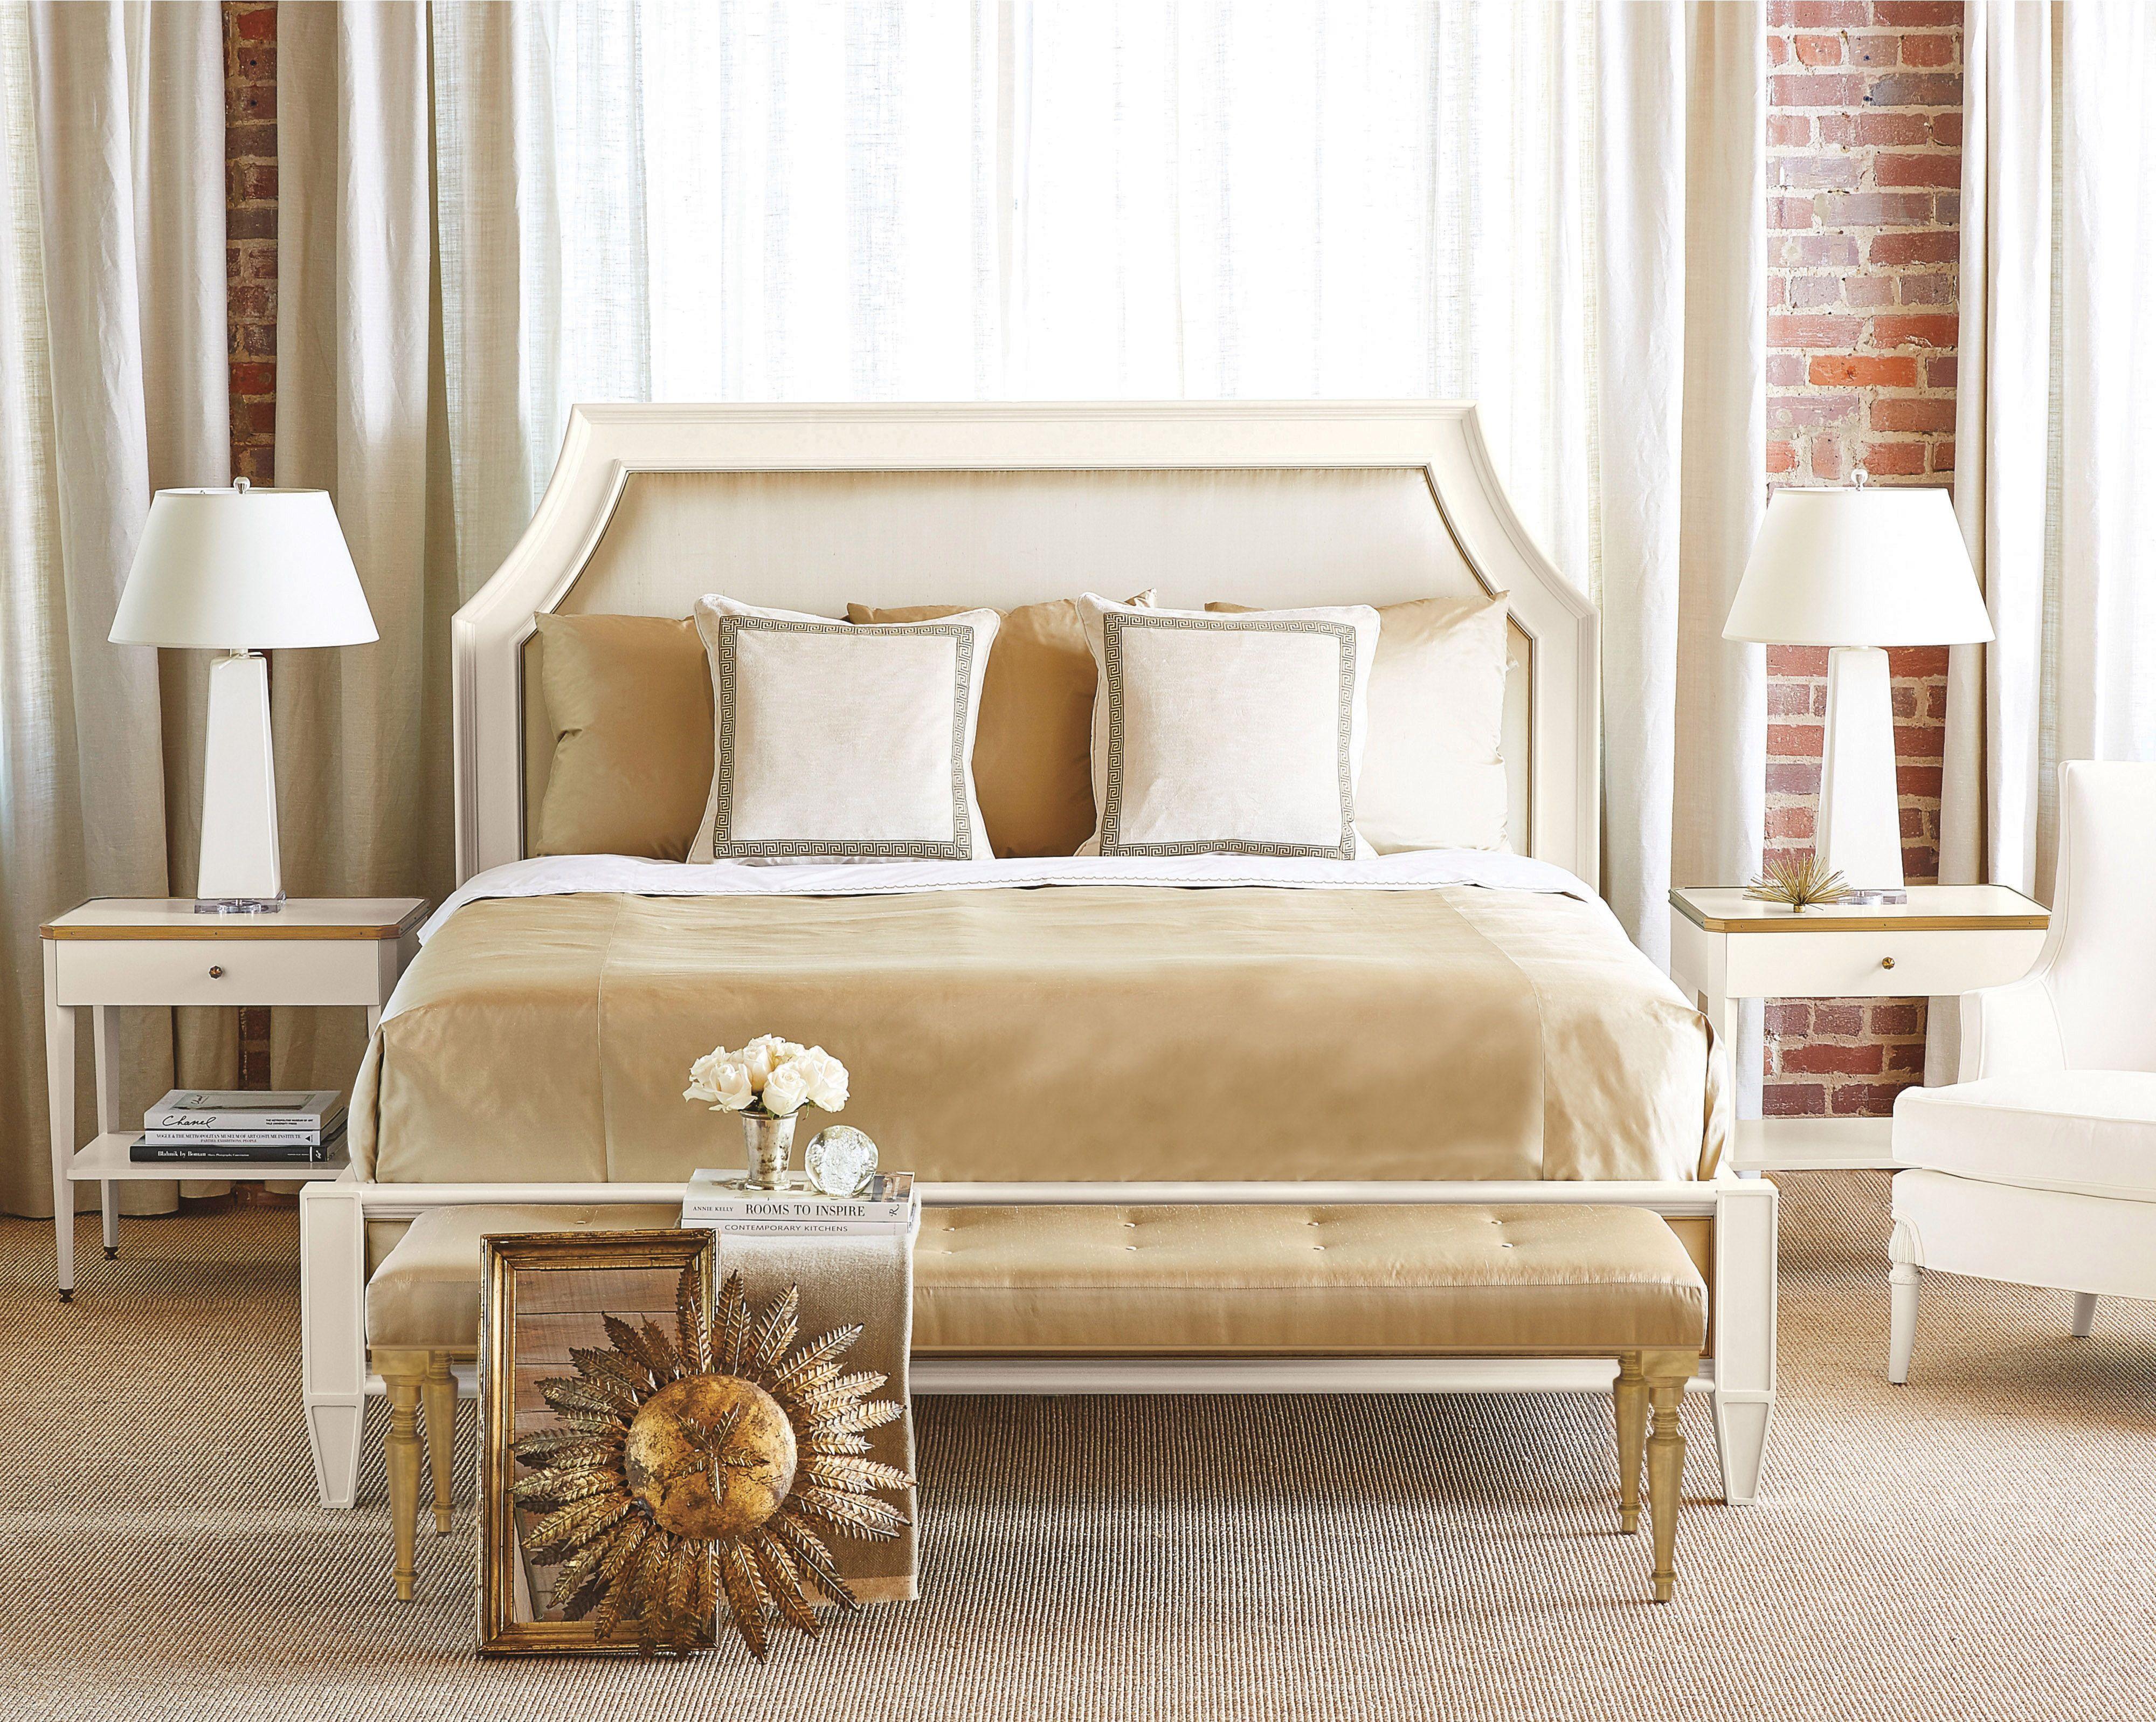 Hickory Chair Furniture Furniture, Large furniture